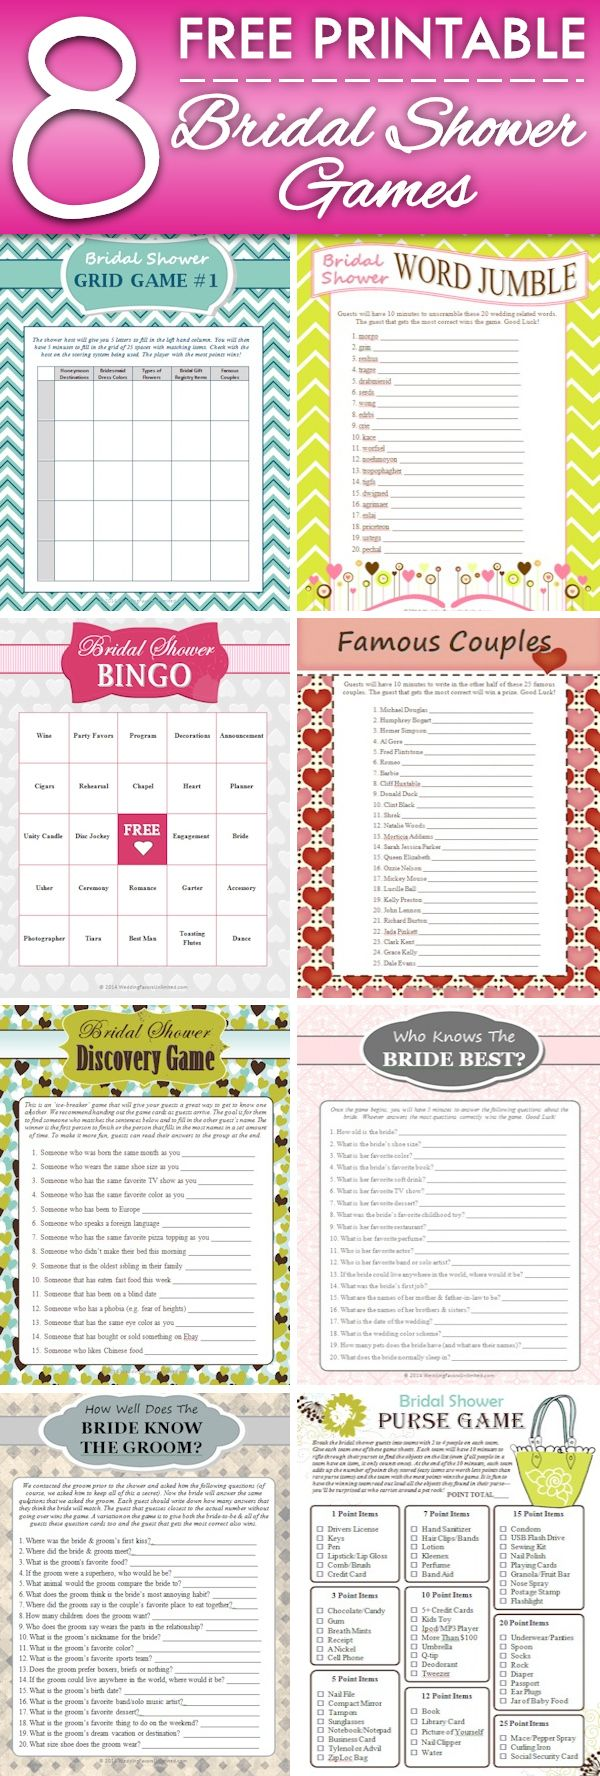 bachelorette party game prize ideas